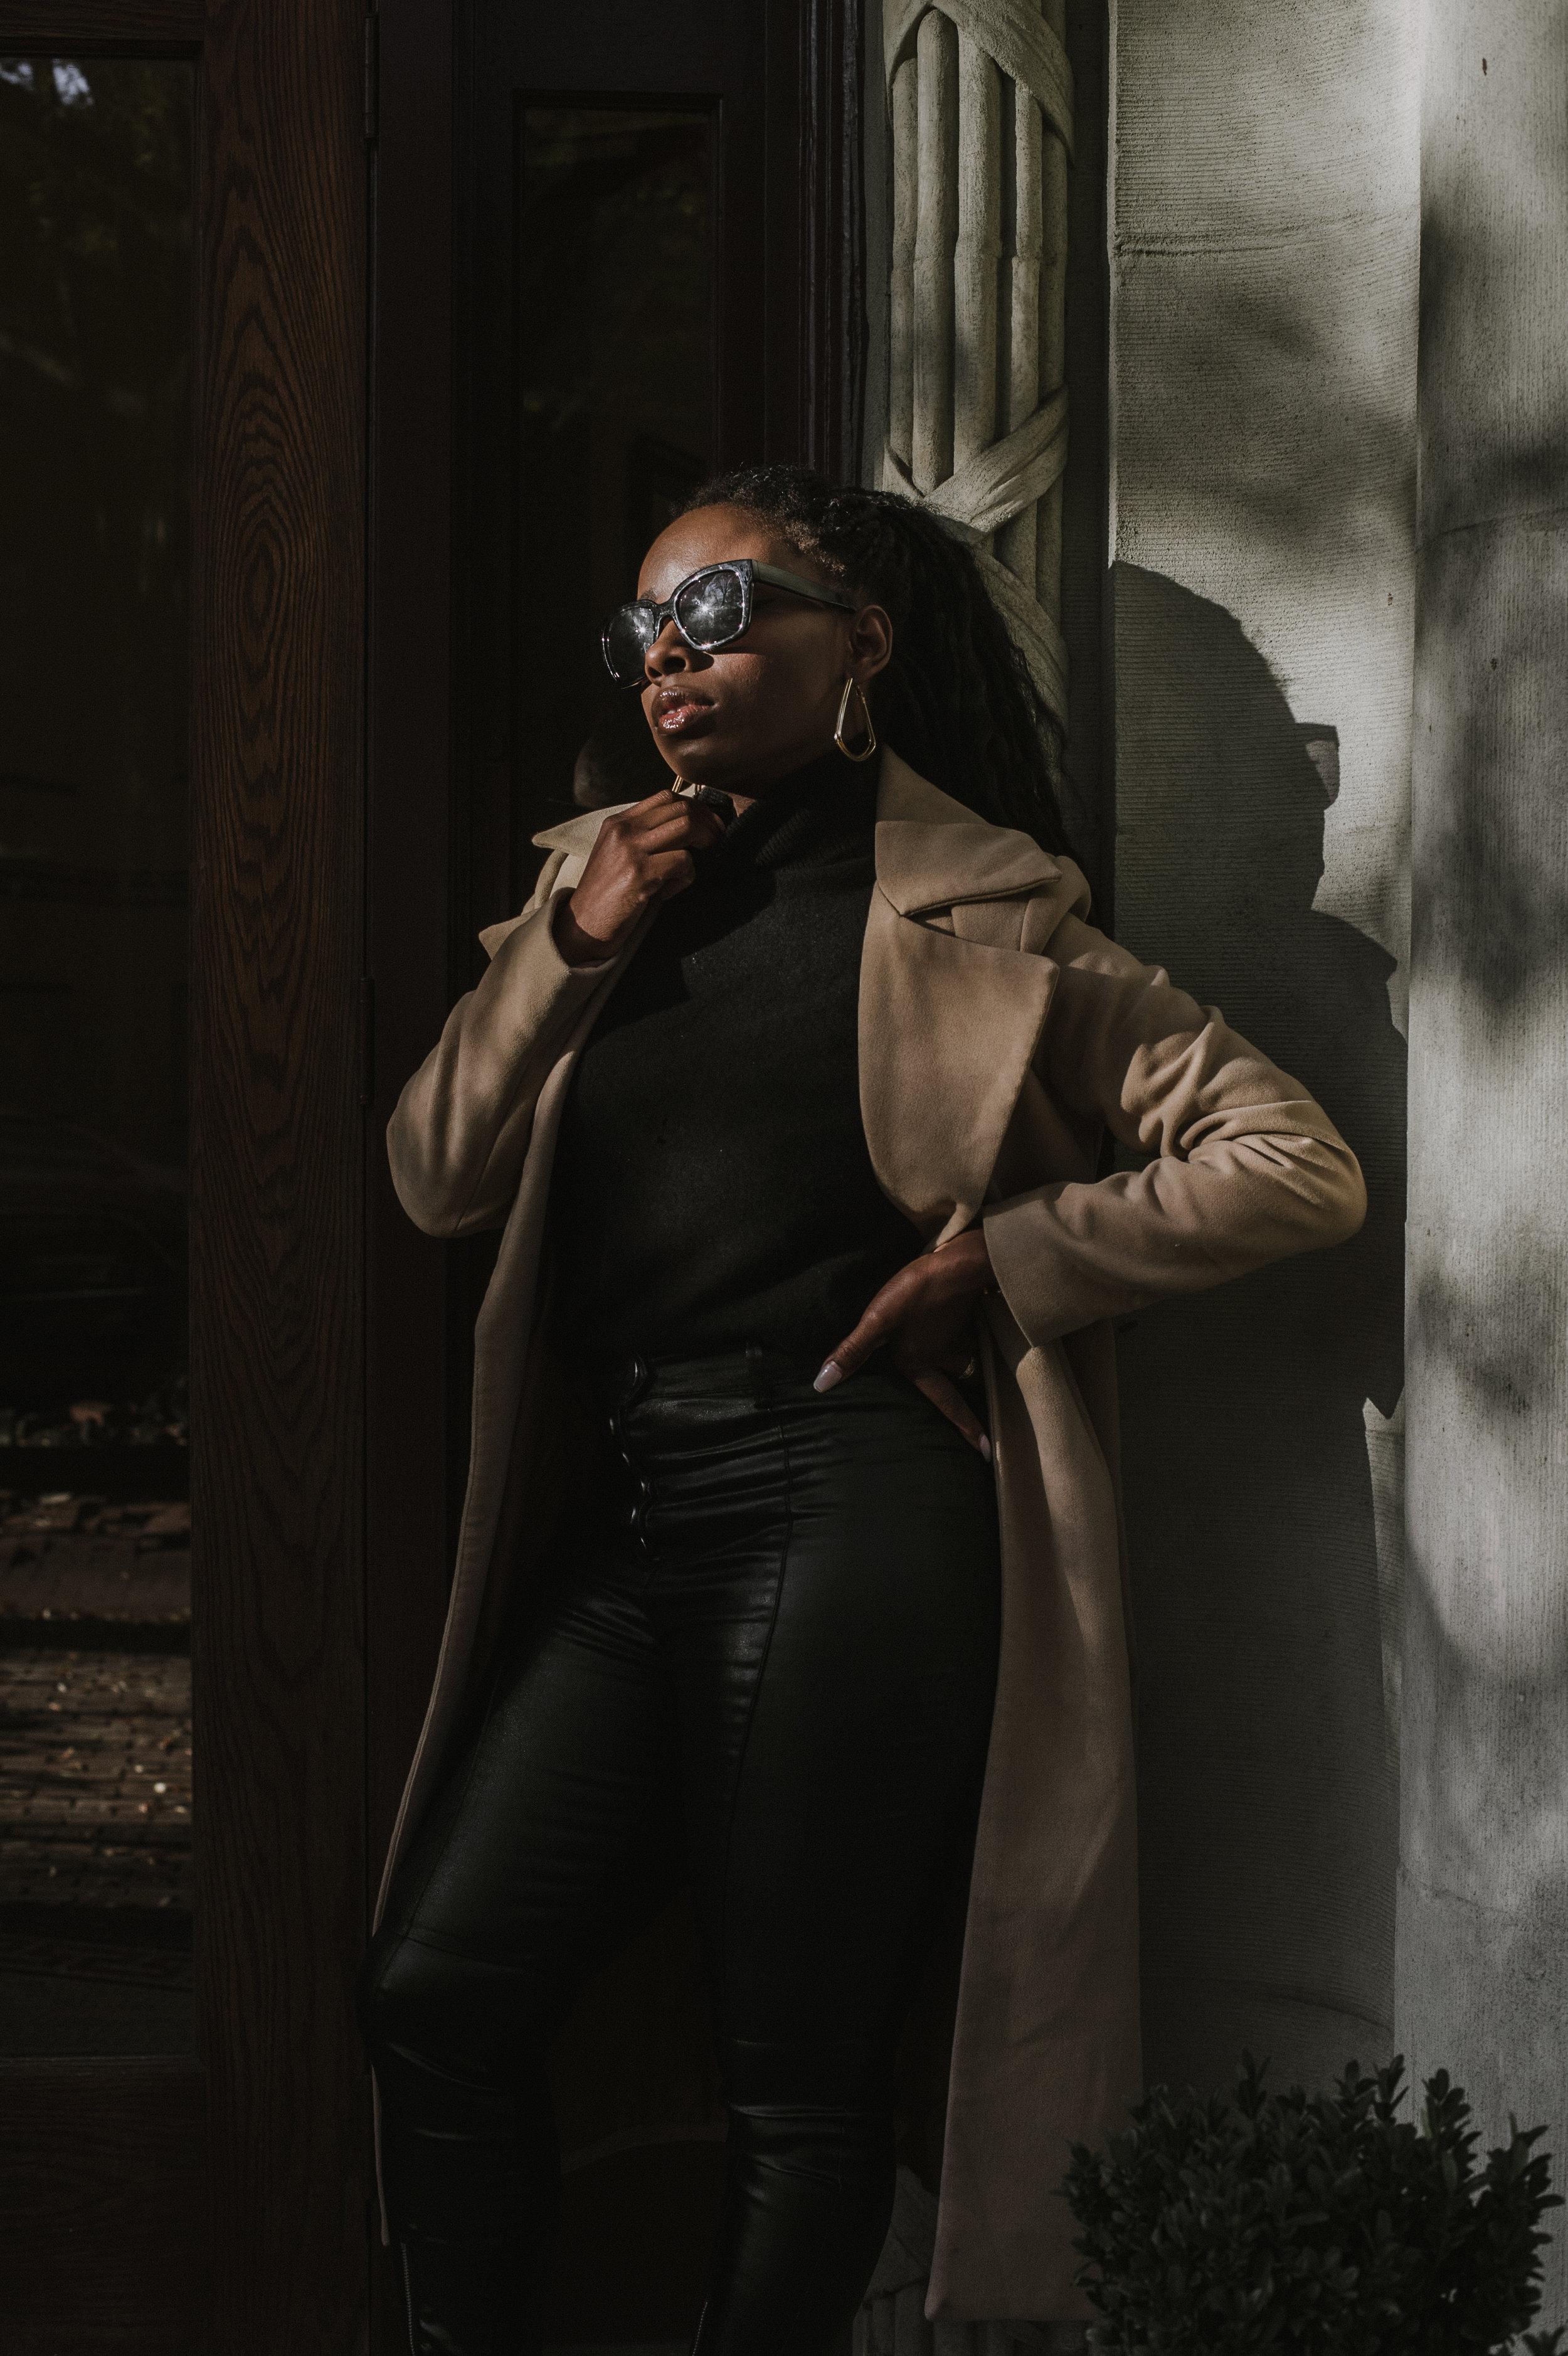 The-Glossier-Tasha-James-Fashion-Style-Blogger-DC-Winter-Coat-All-Black-30.jpg